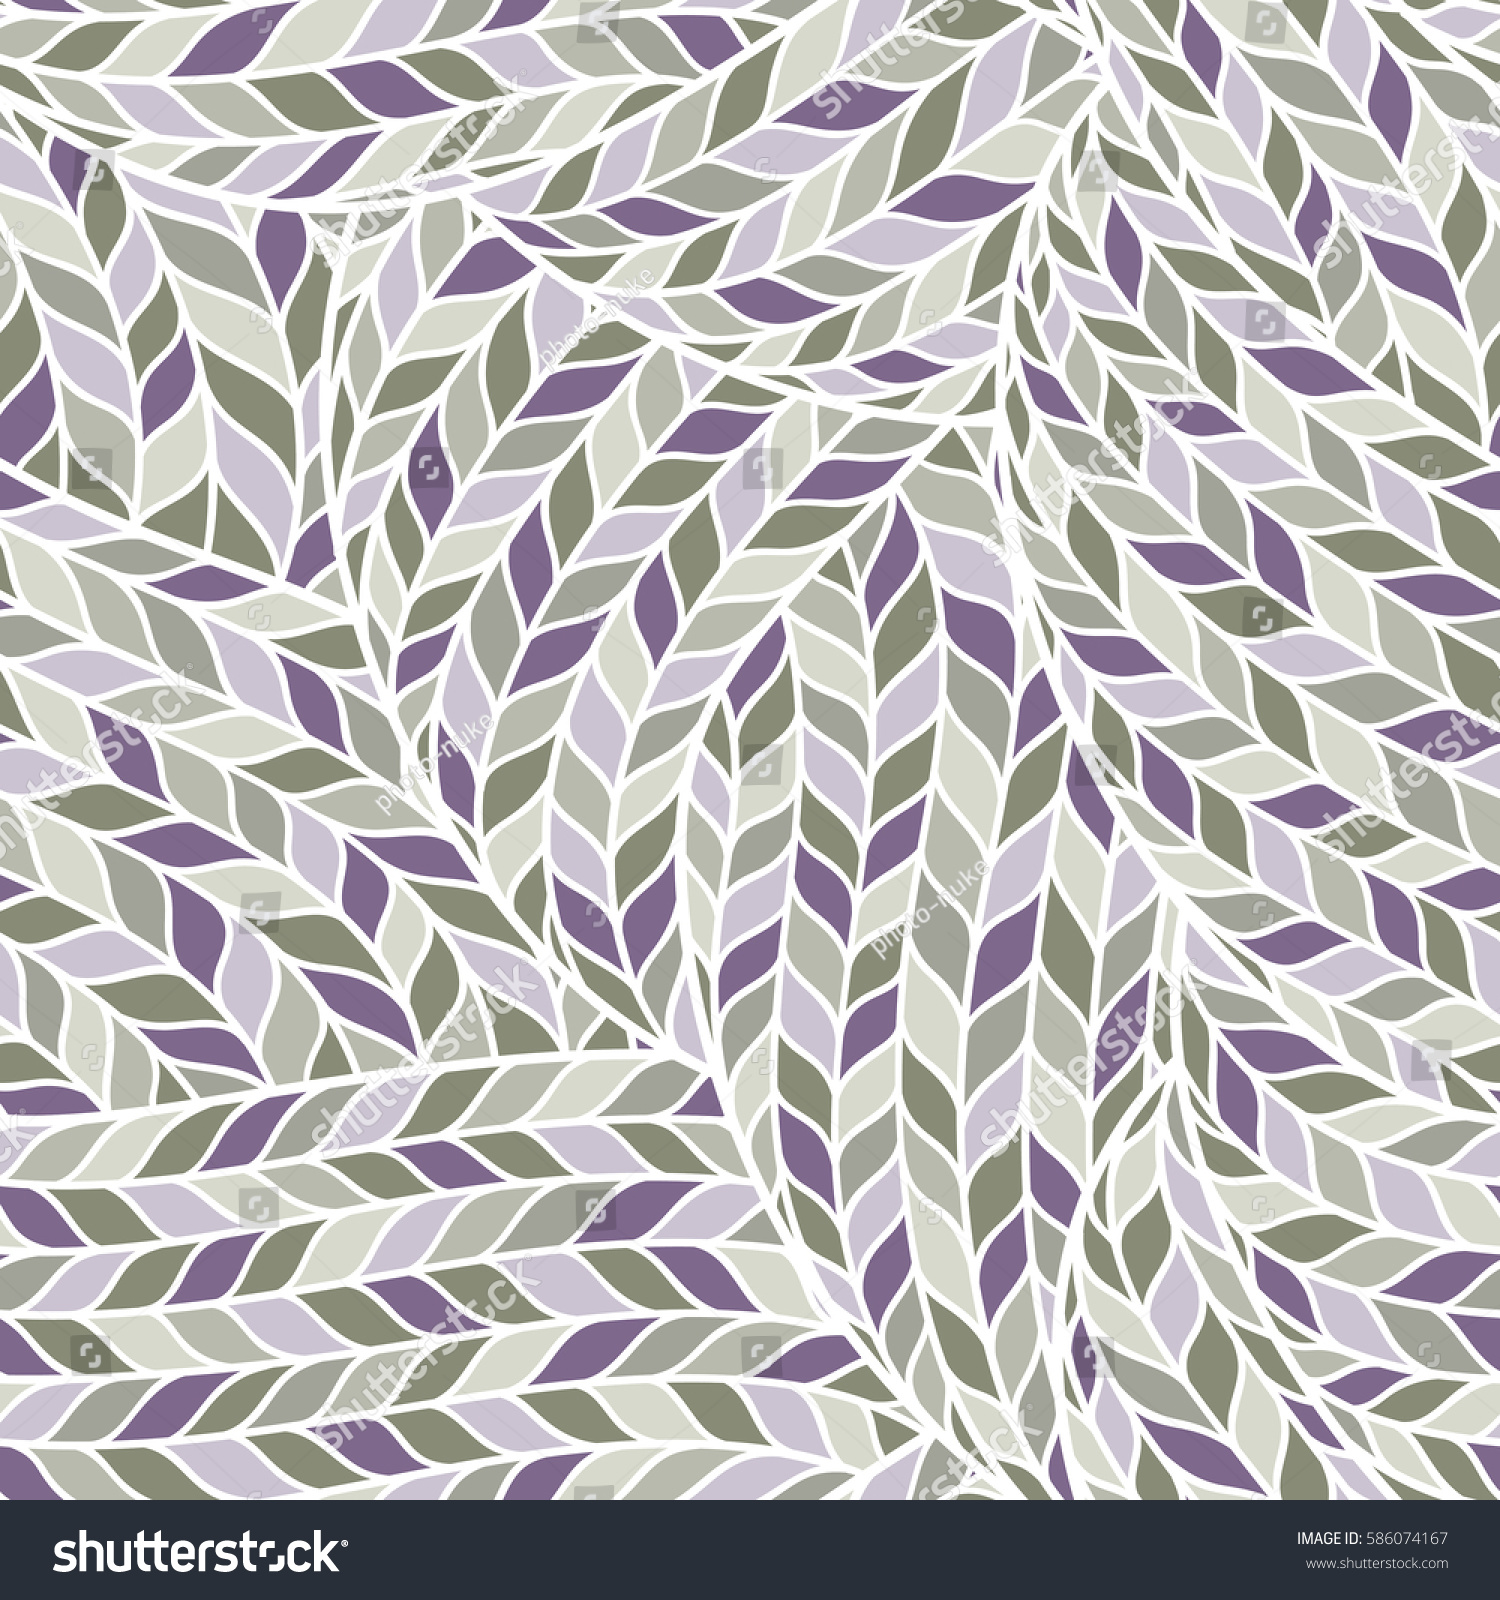 Seamless Pattern Knitting Braids Endless Texture Stock Vector ...